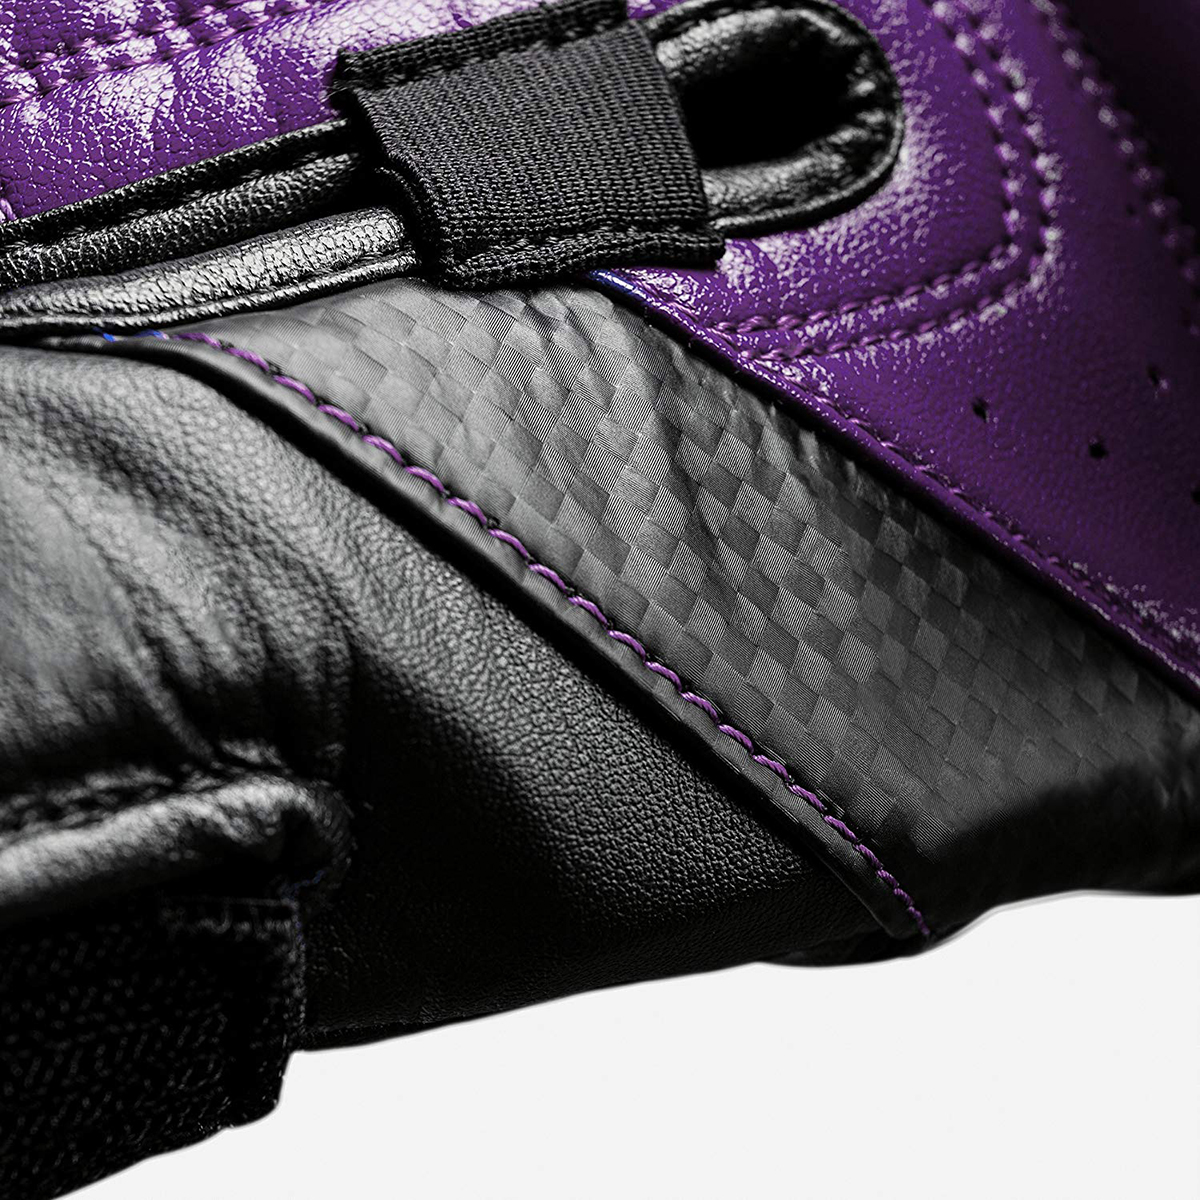 Hayabusa-T3-Dual-X-Hook-and-Loop-Closure-Vylar-Leather-Training-Boxing-Gloves thumbnail 18